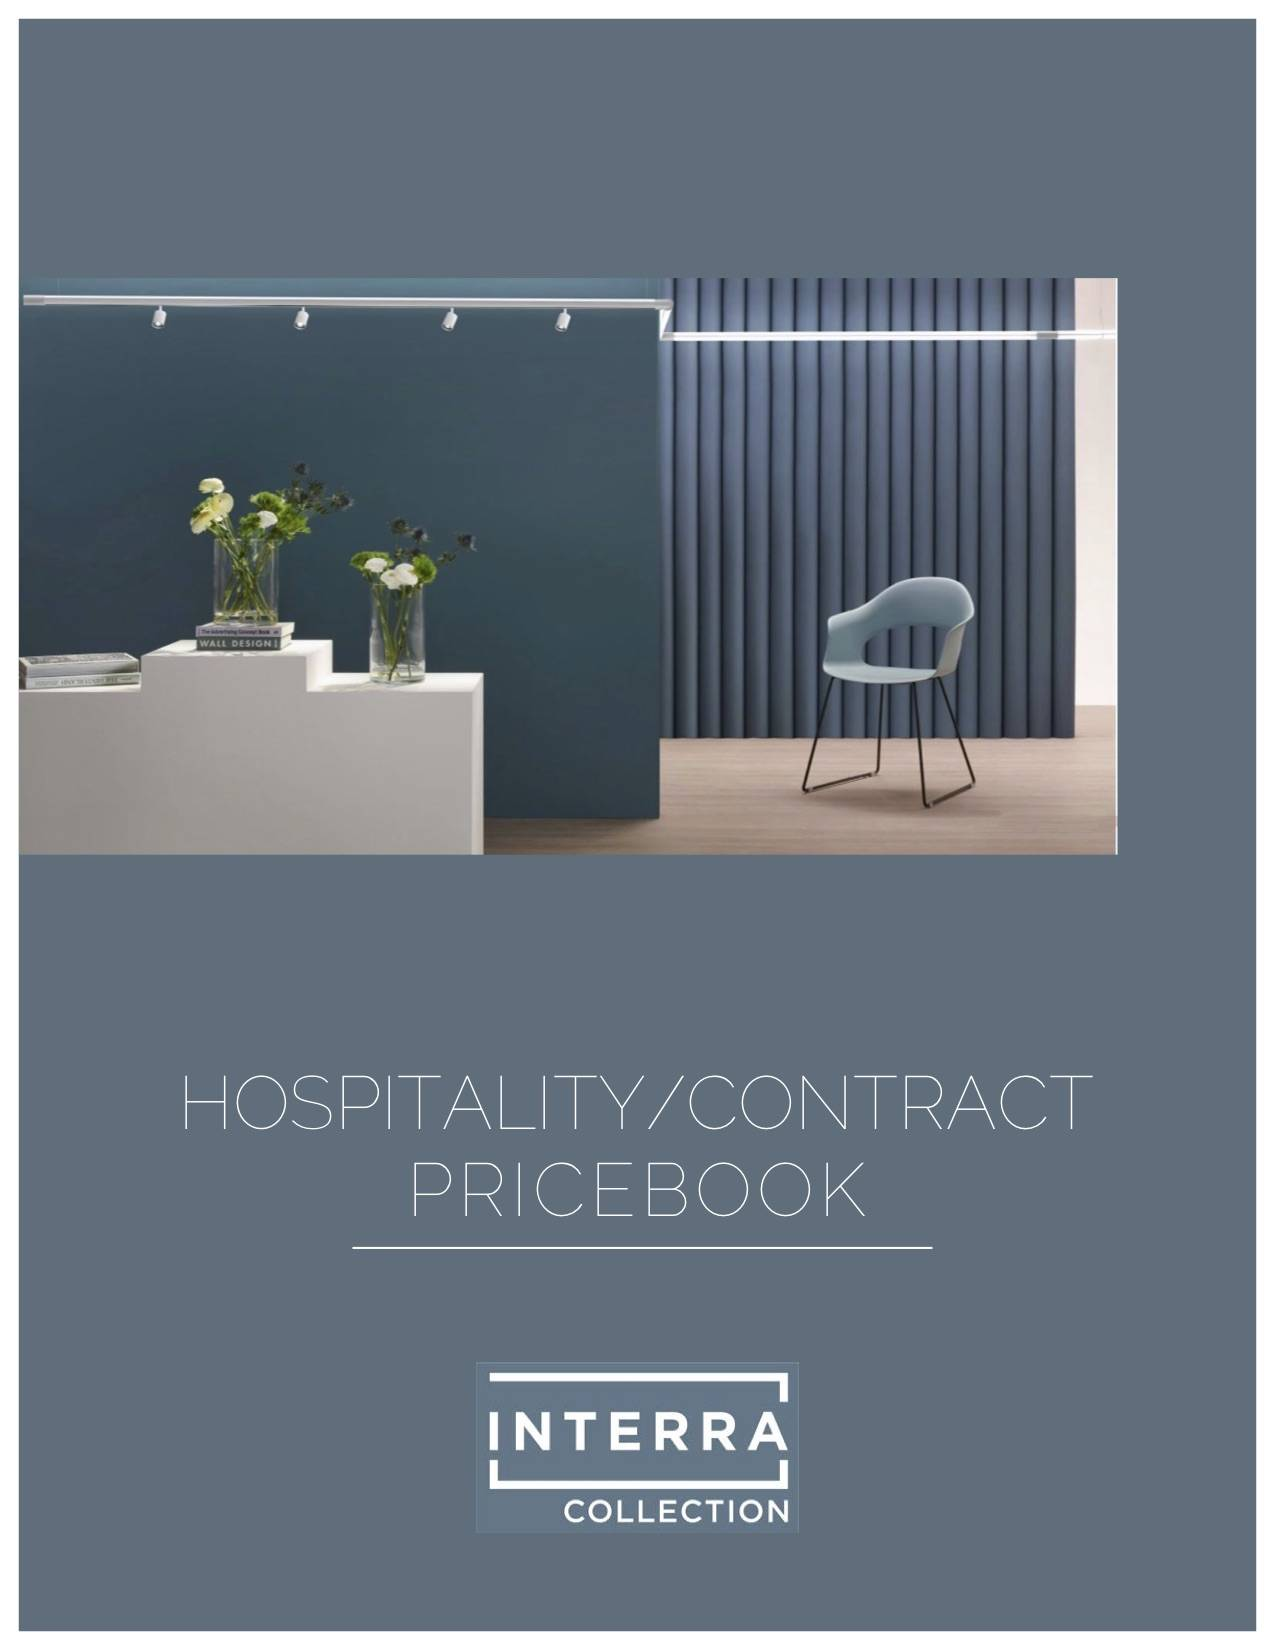 Hospitality/Contract Pricebook